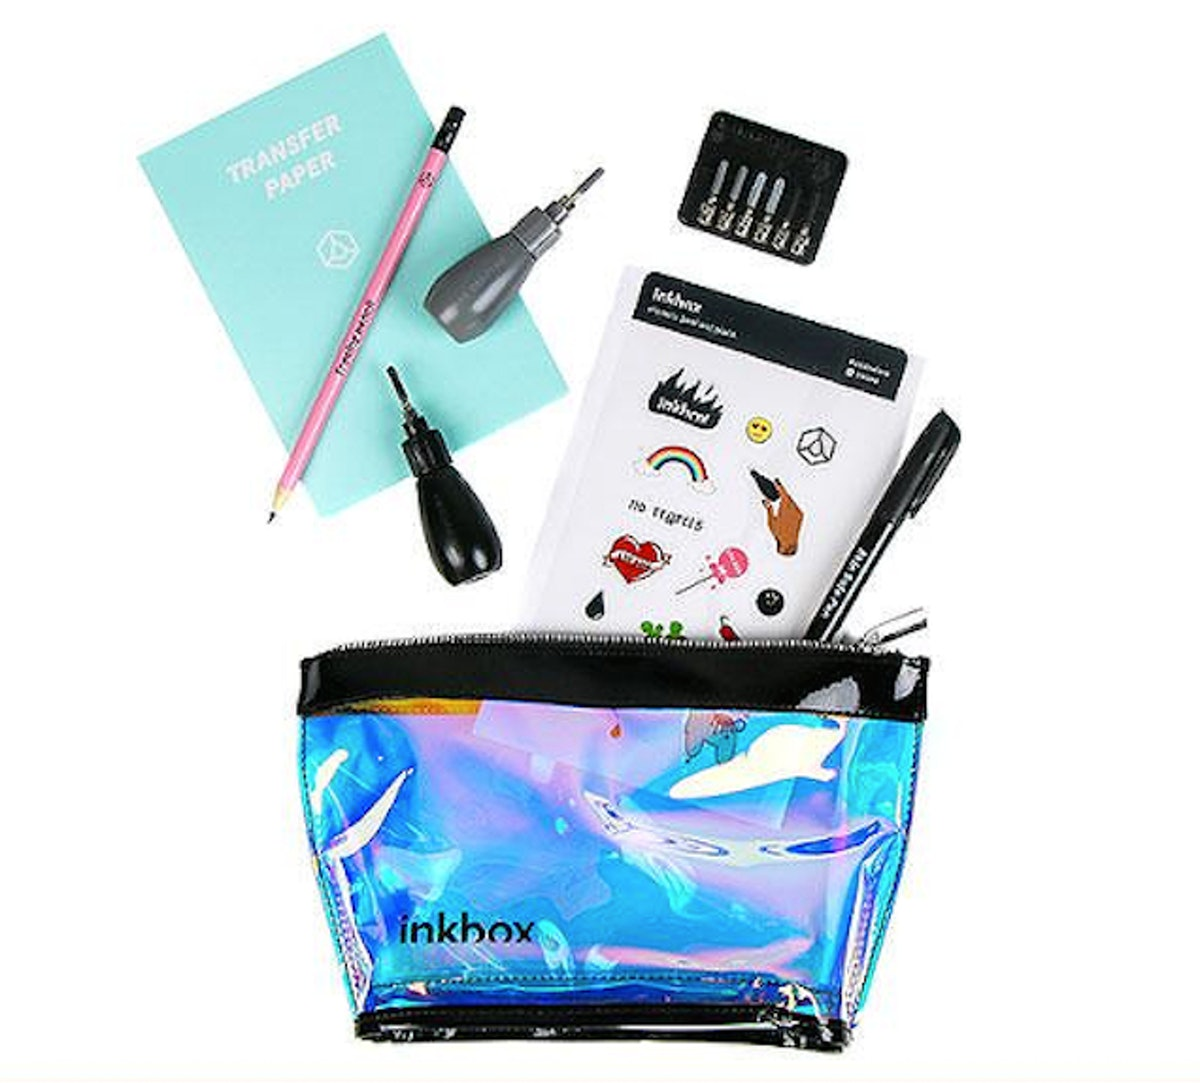 Inkbox Freehand Pro Kit